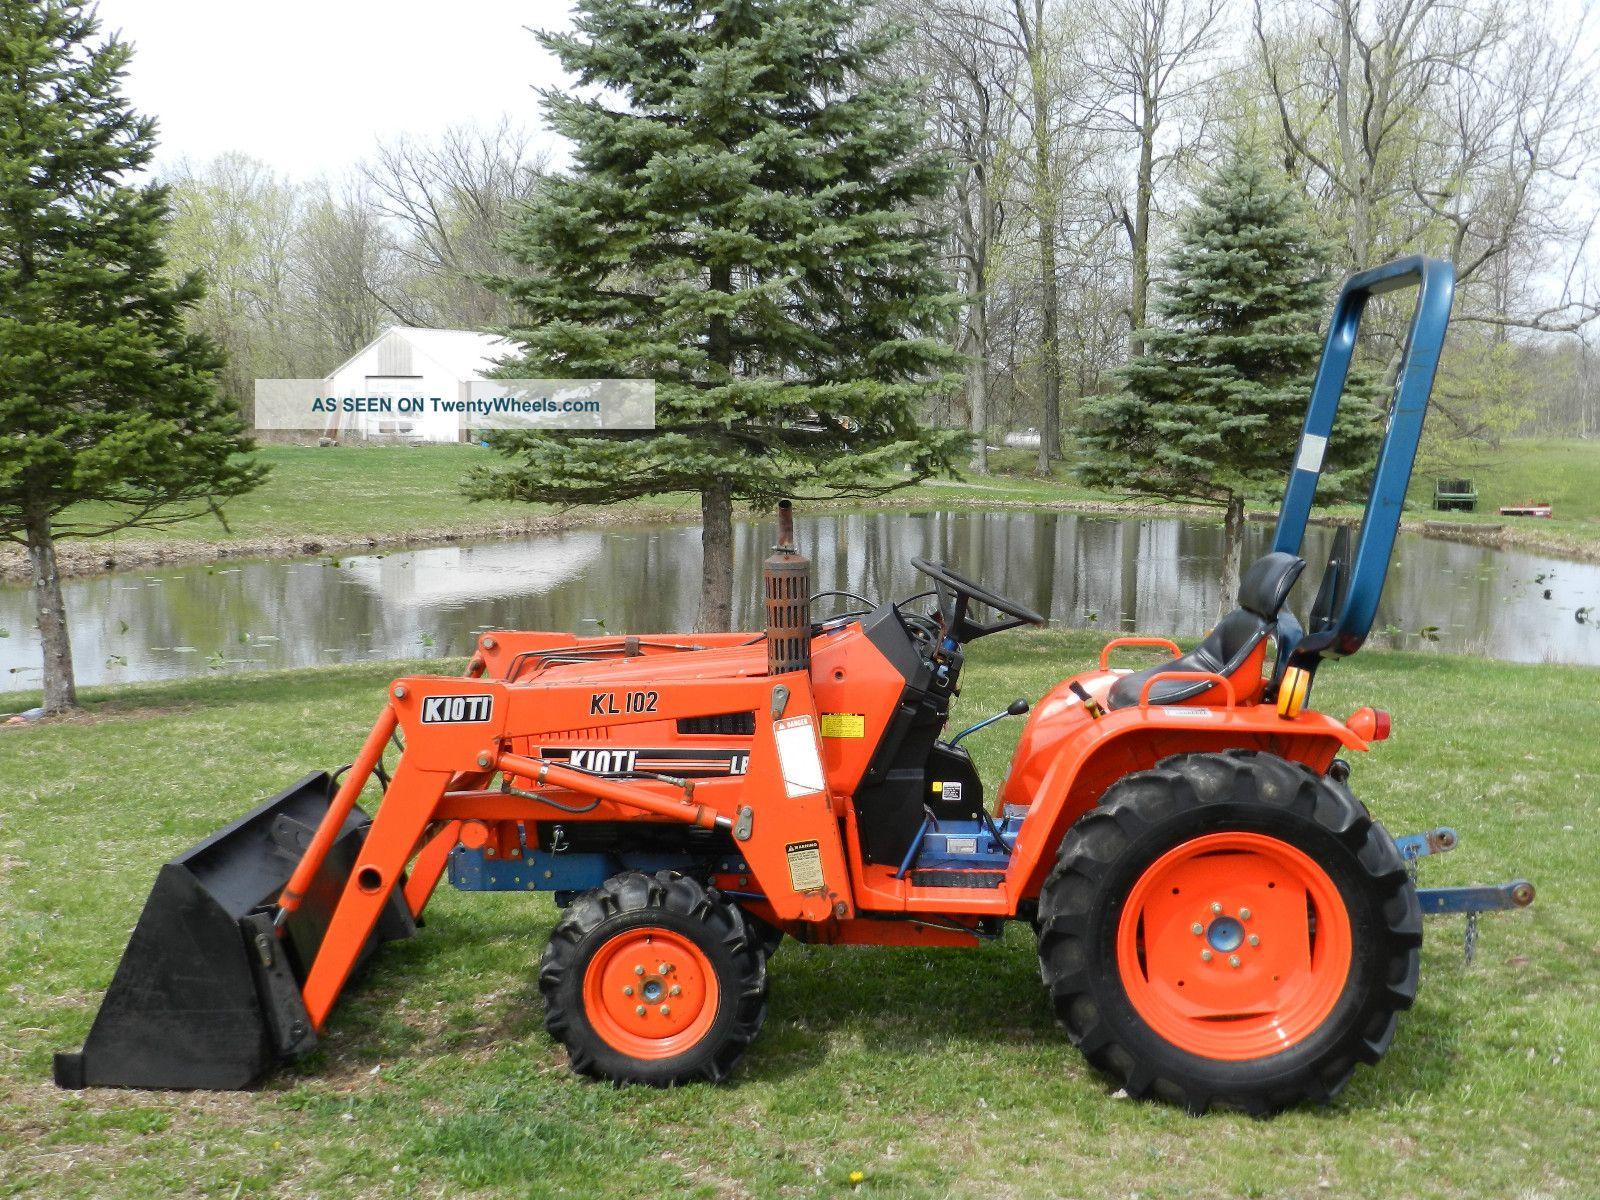 Kioti Compact Tractors : Kioti b compact tractor front hydraulic loader